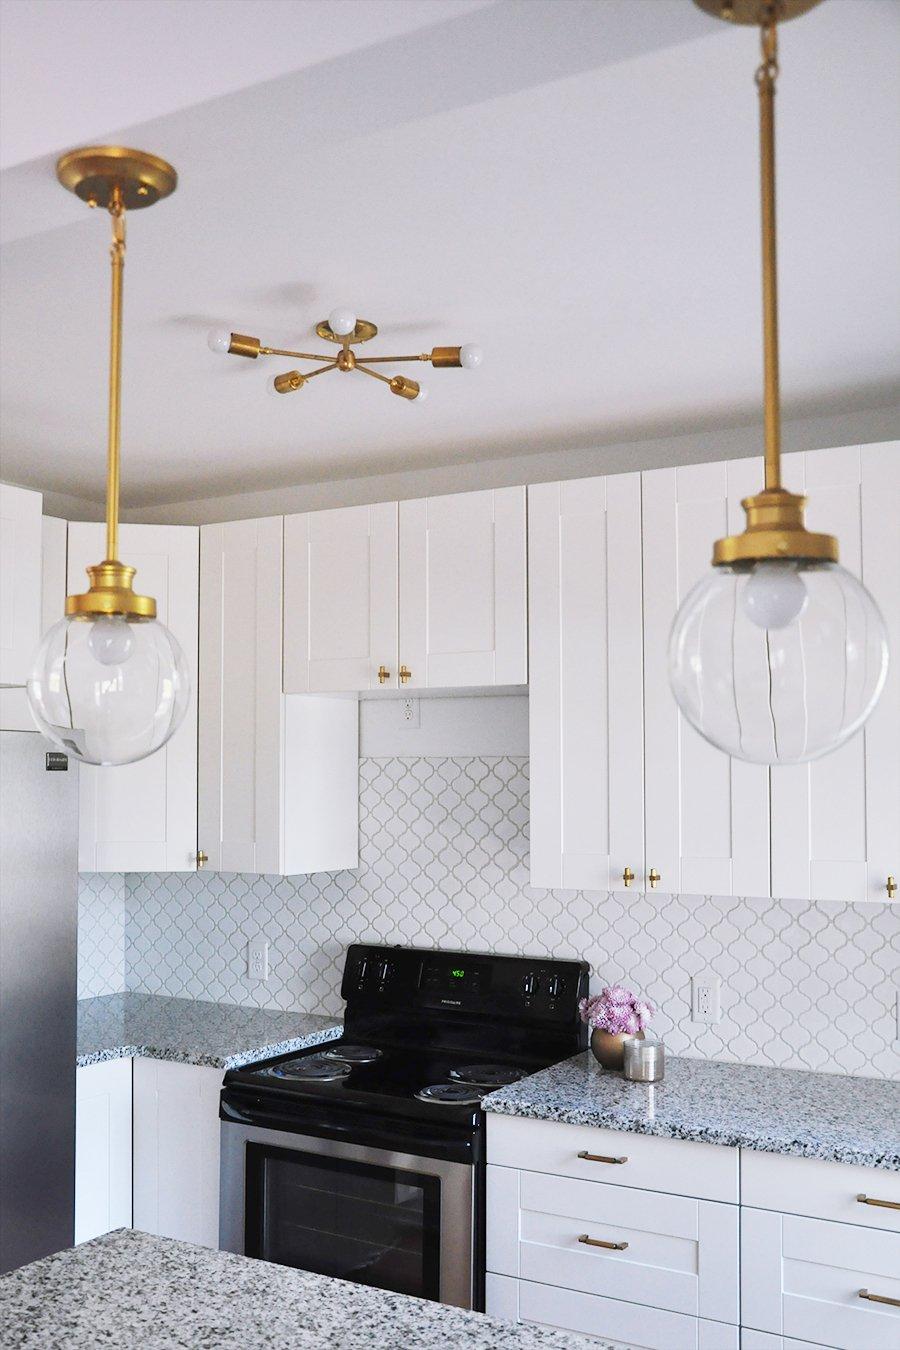 home-renovation-progress-report-kitchen-updates-4